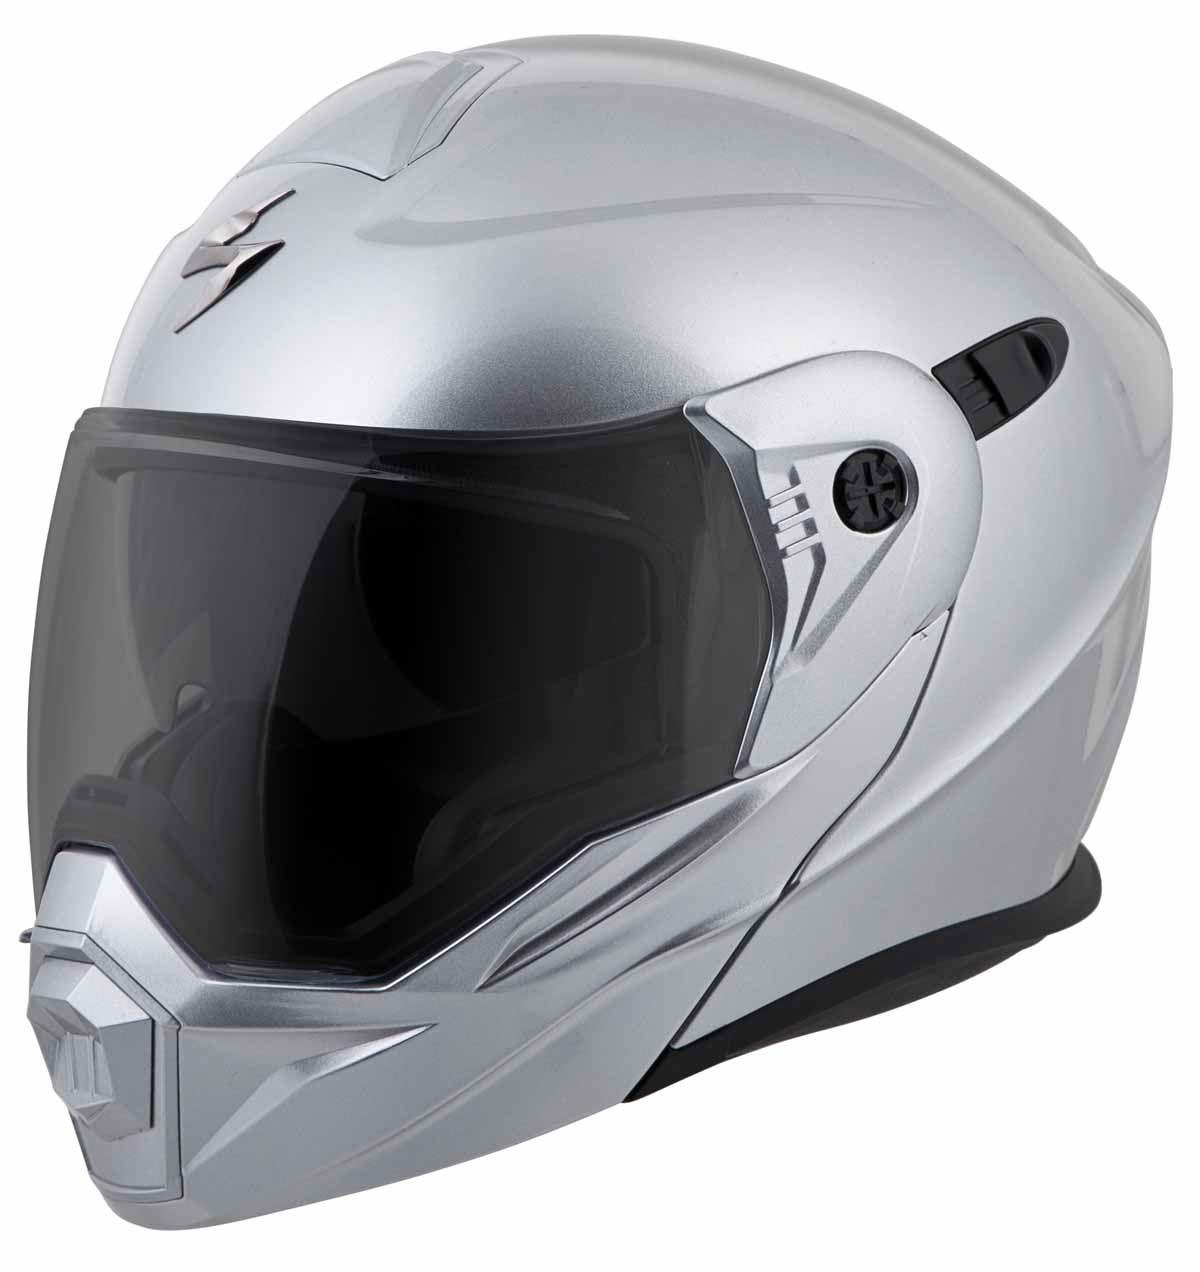 Scorpion-EXO-AT950-Helmet-Flip-Up-Modular-Dual-Sport-Adventure-ADV-DOT-XS-3XL miniature 15